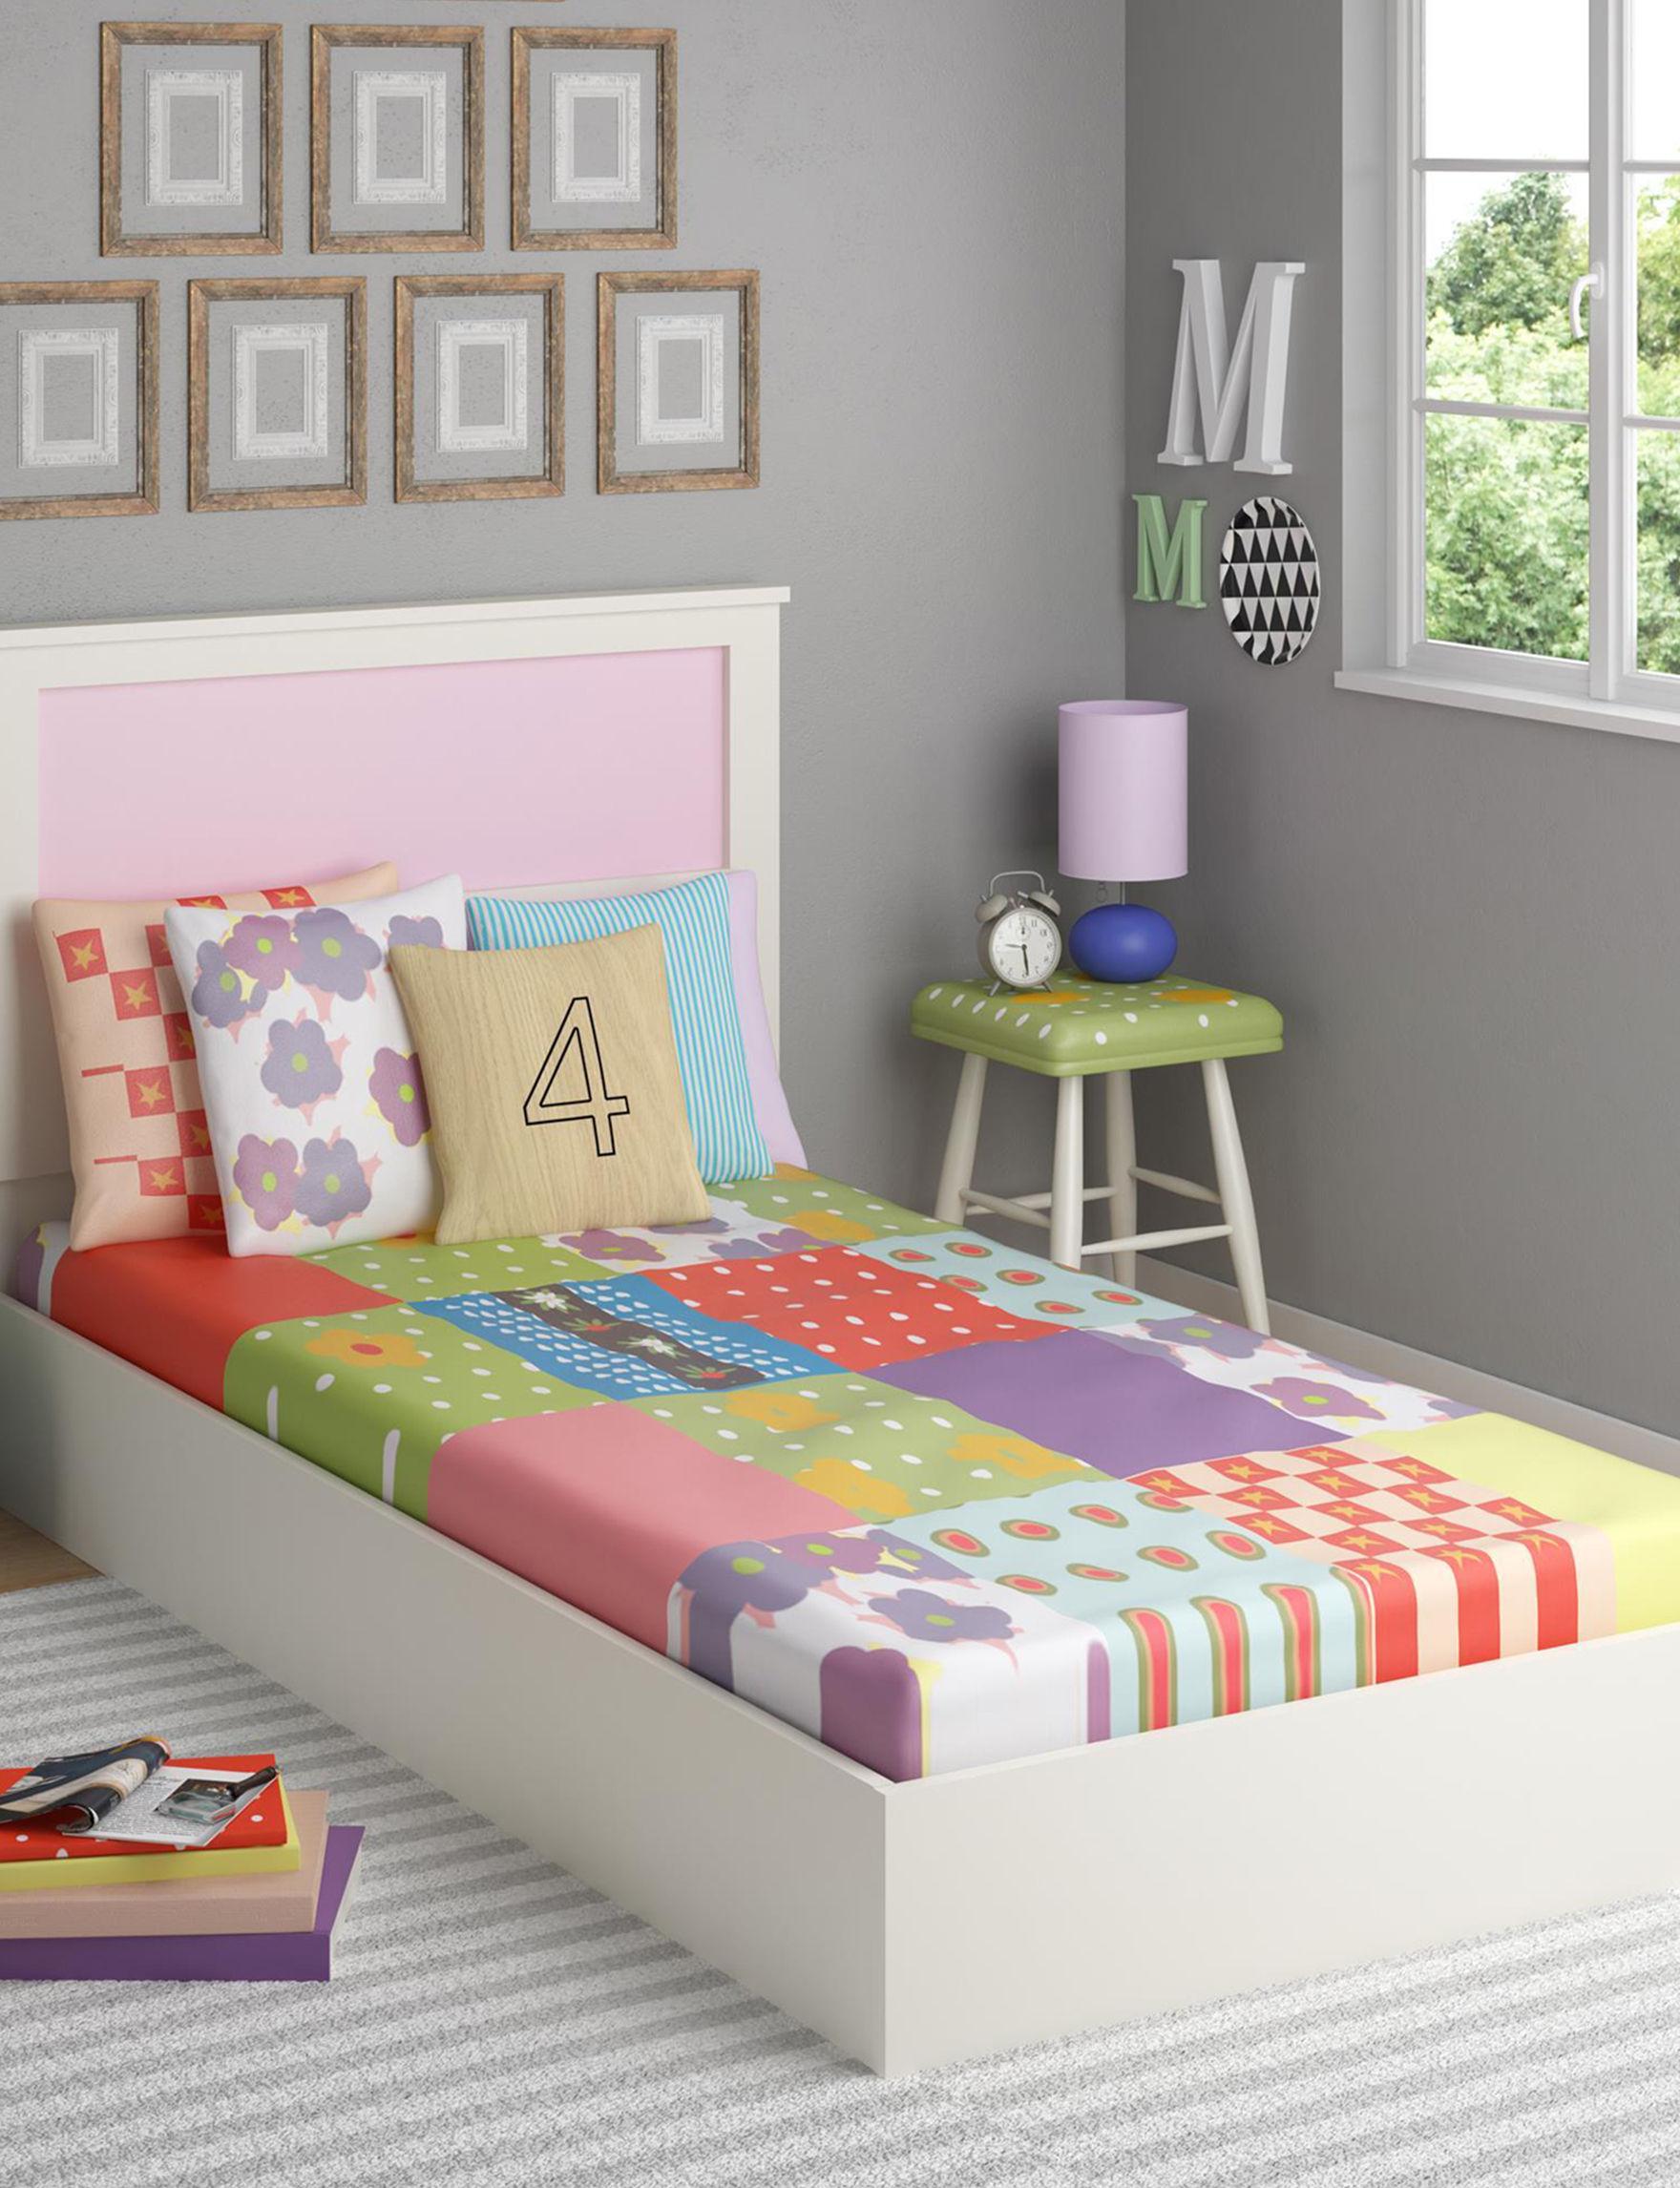 Ameriwood White Beds & Headboards Bedroom Furniture